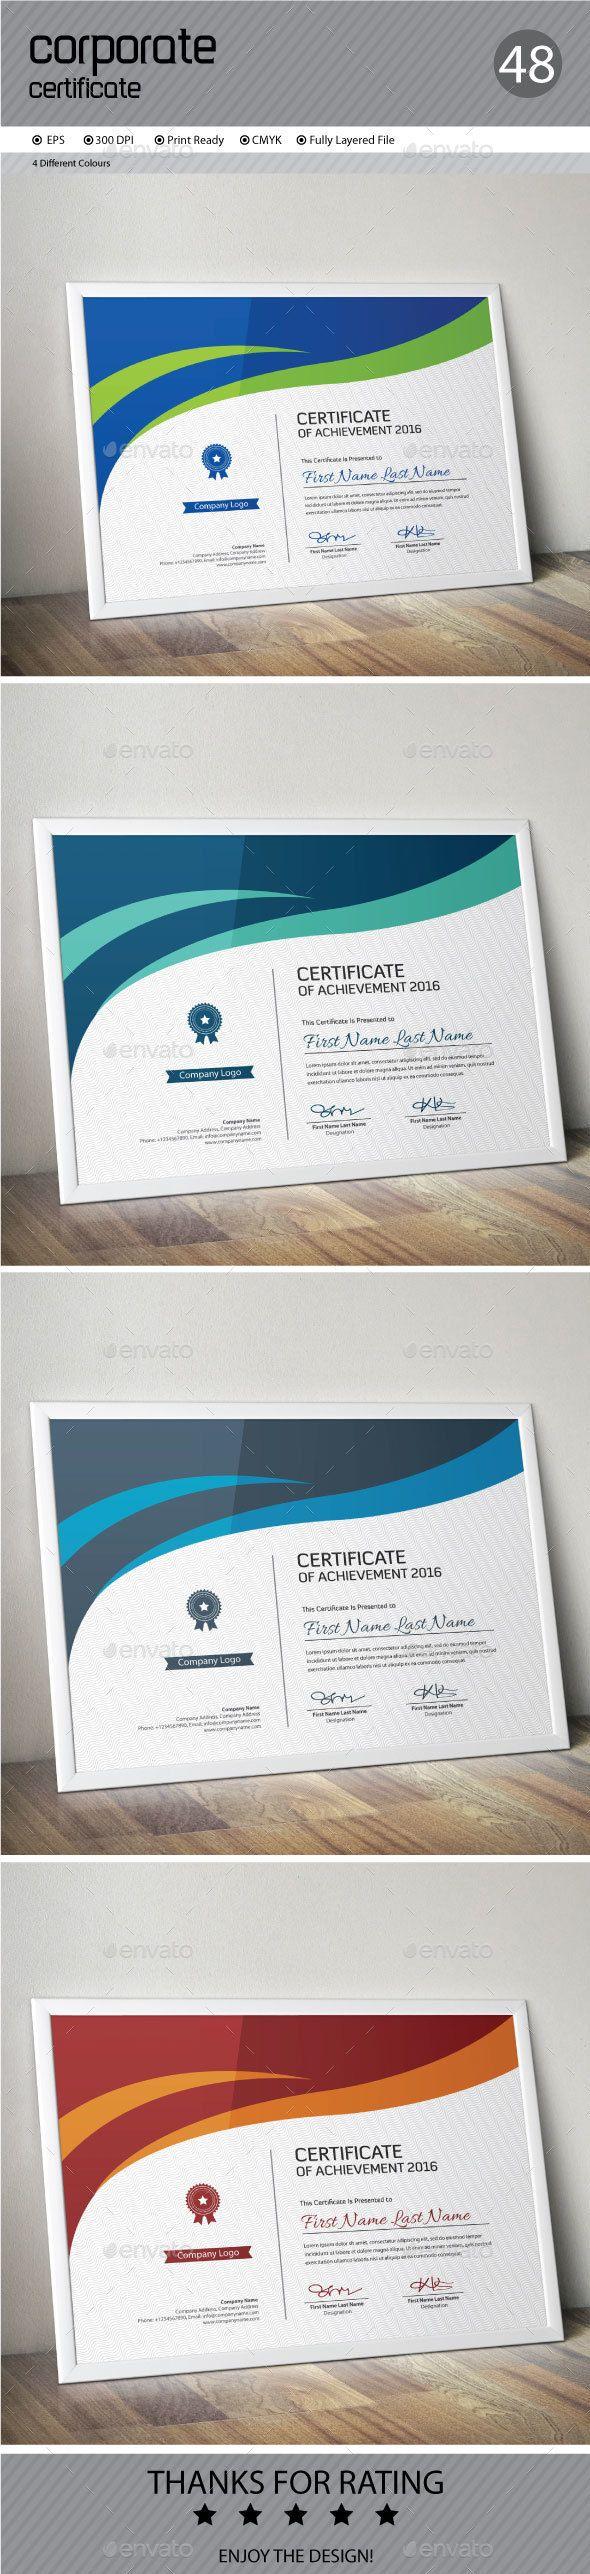 Certificate Template Vector EPS. Download here: http://graphicriver.net/item/certificate/14420230?ref=ksioks